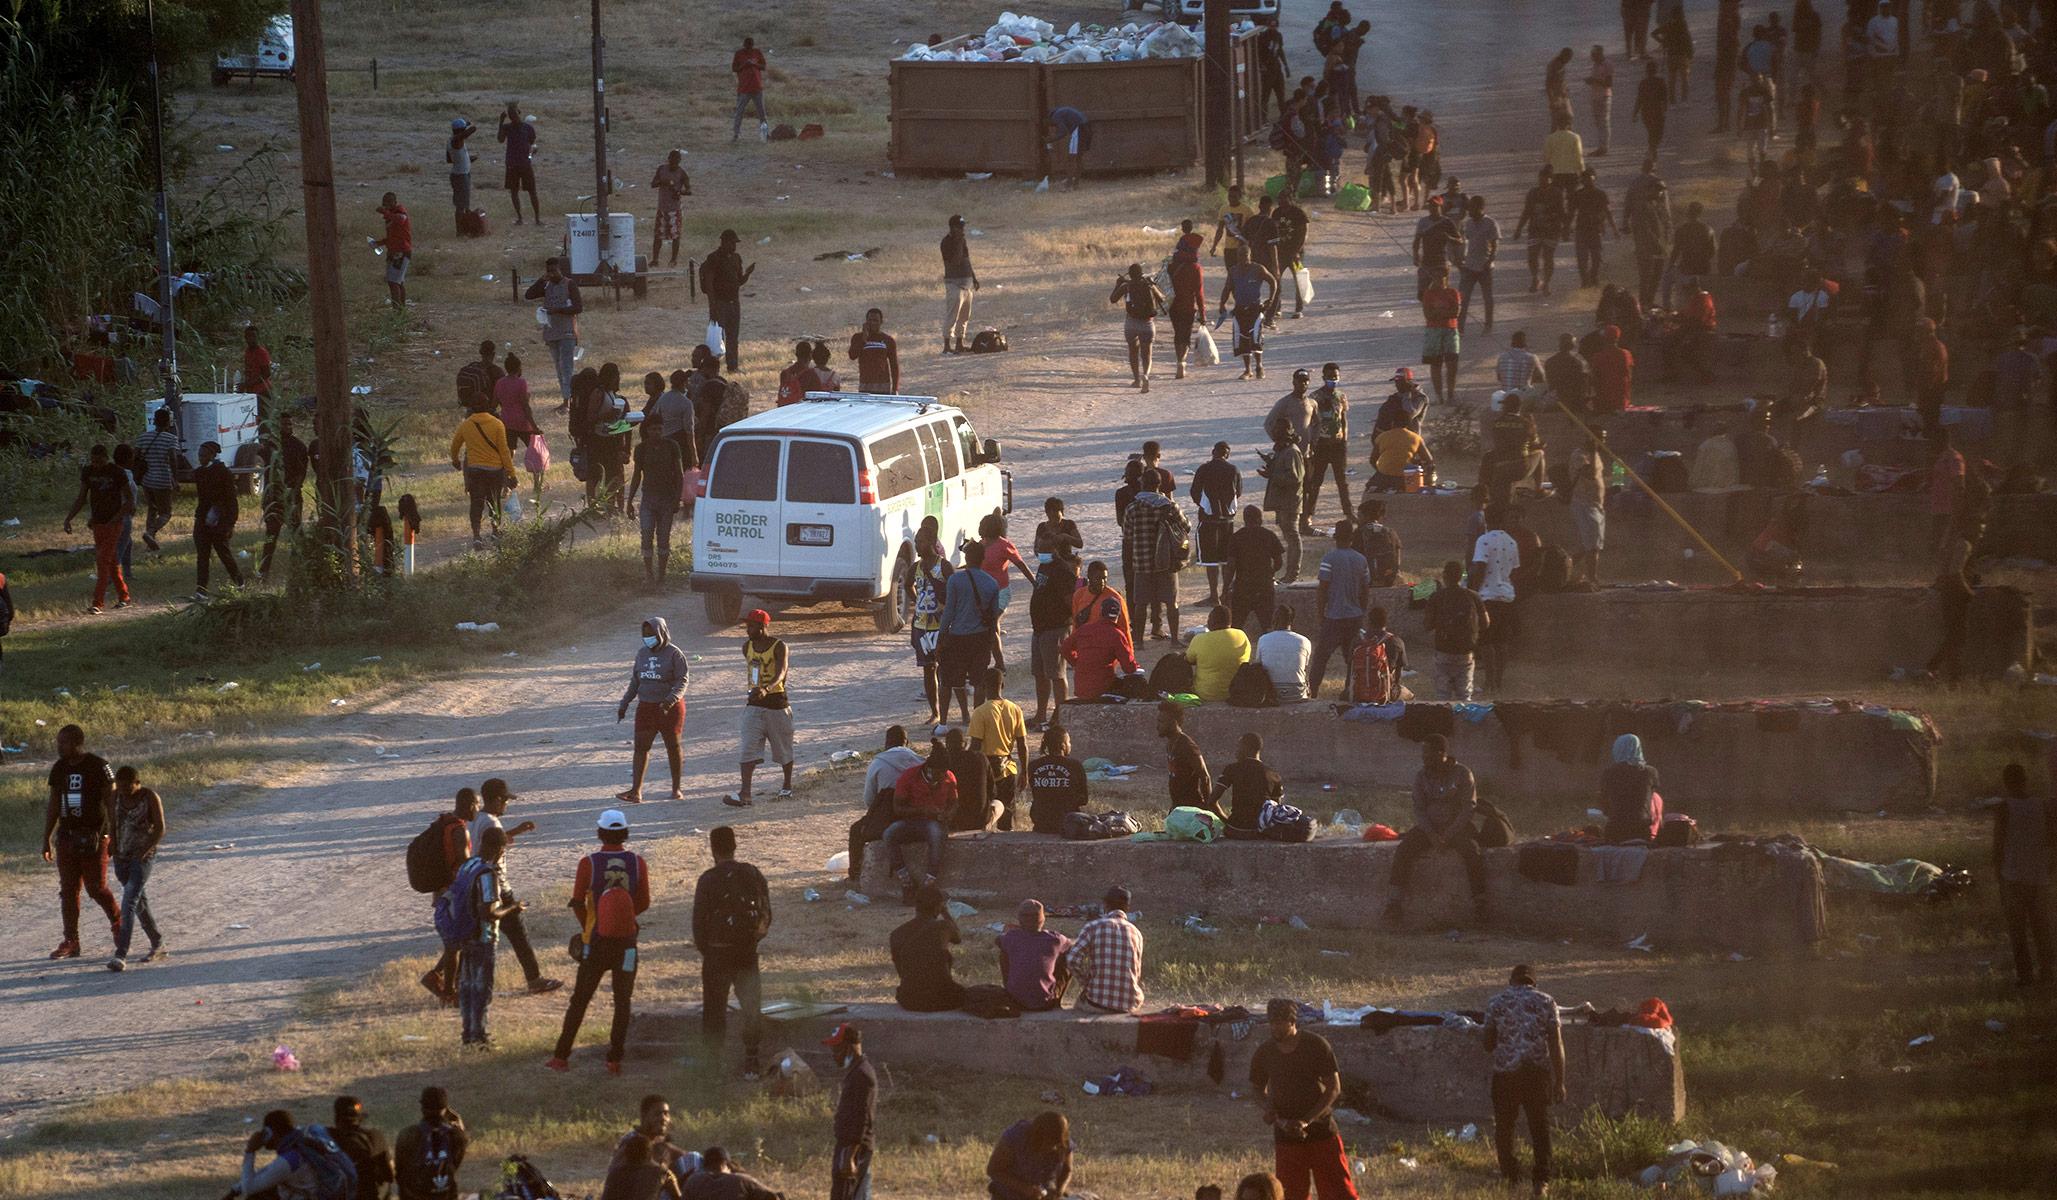 Thousands of Migrants Camp Under Texas Bridge as Border Patrol 'Overwhelmed'